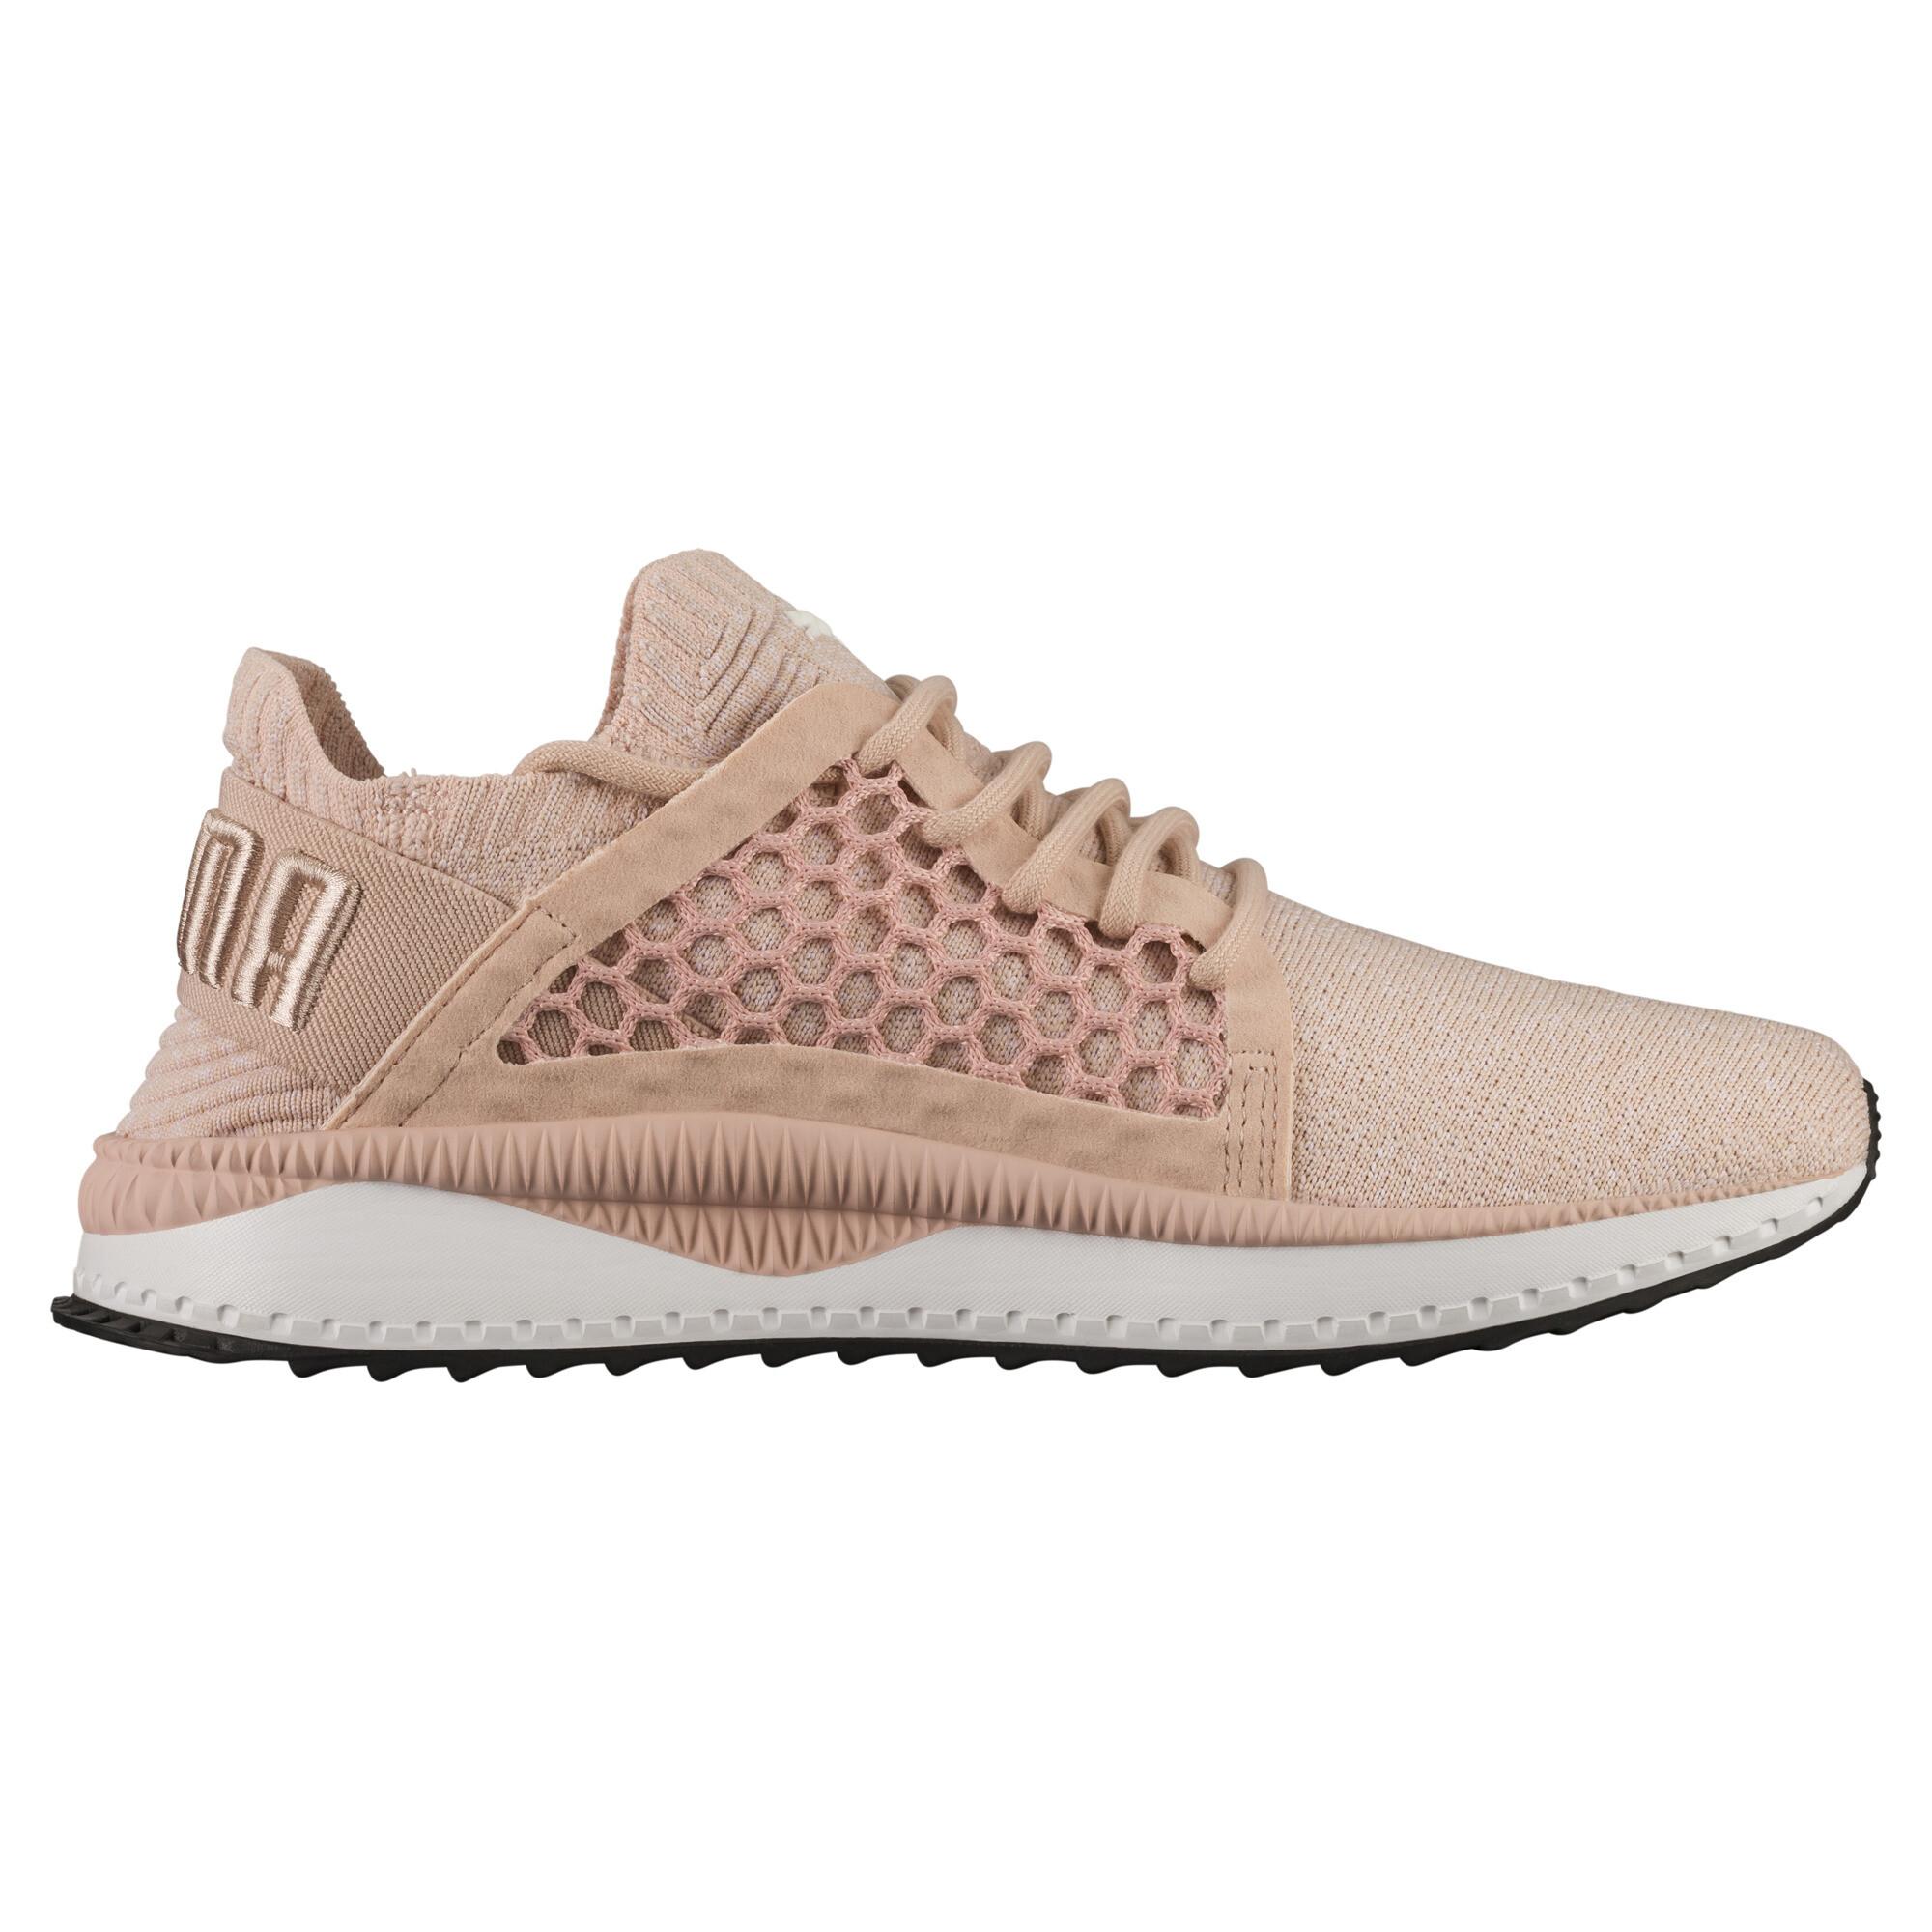 PUMA-TSUGI-NETFIT-evoKNIT-Sneaker-Frauen-Schuhe-Neu Indexbild 22